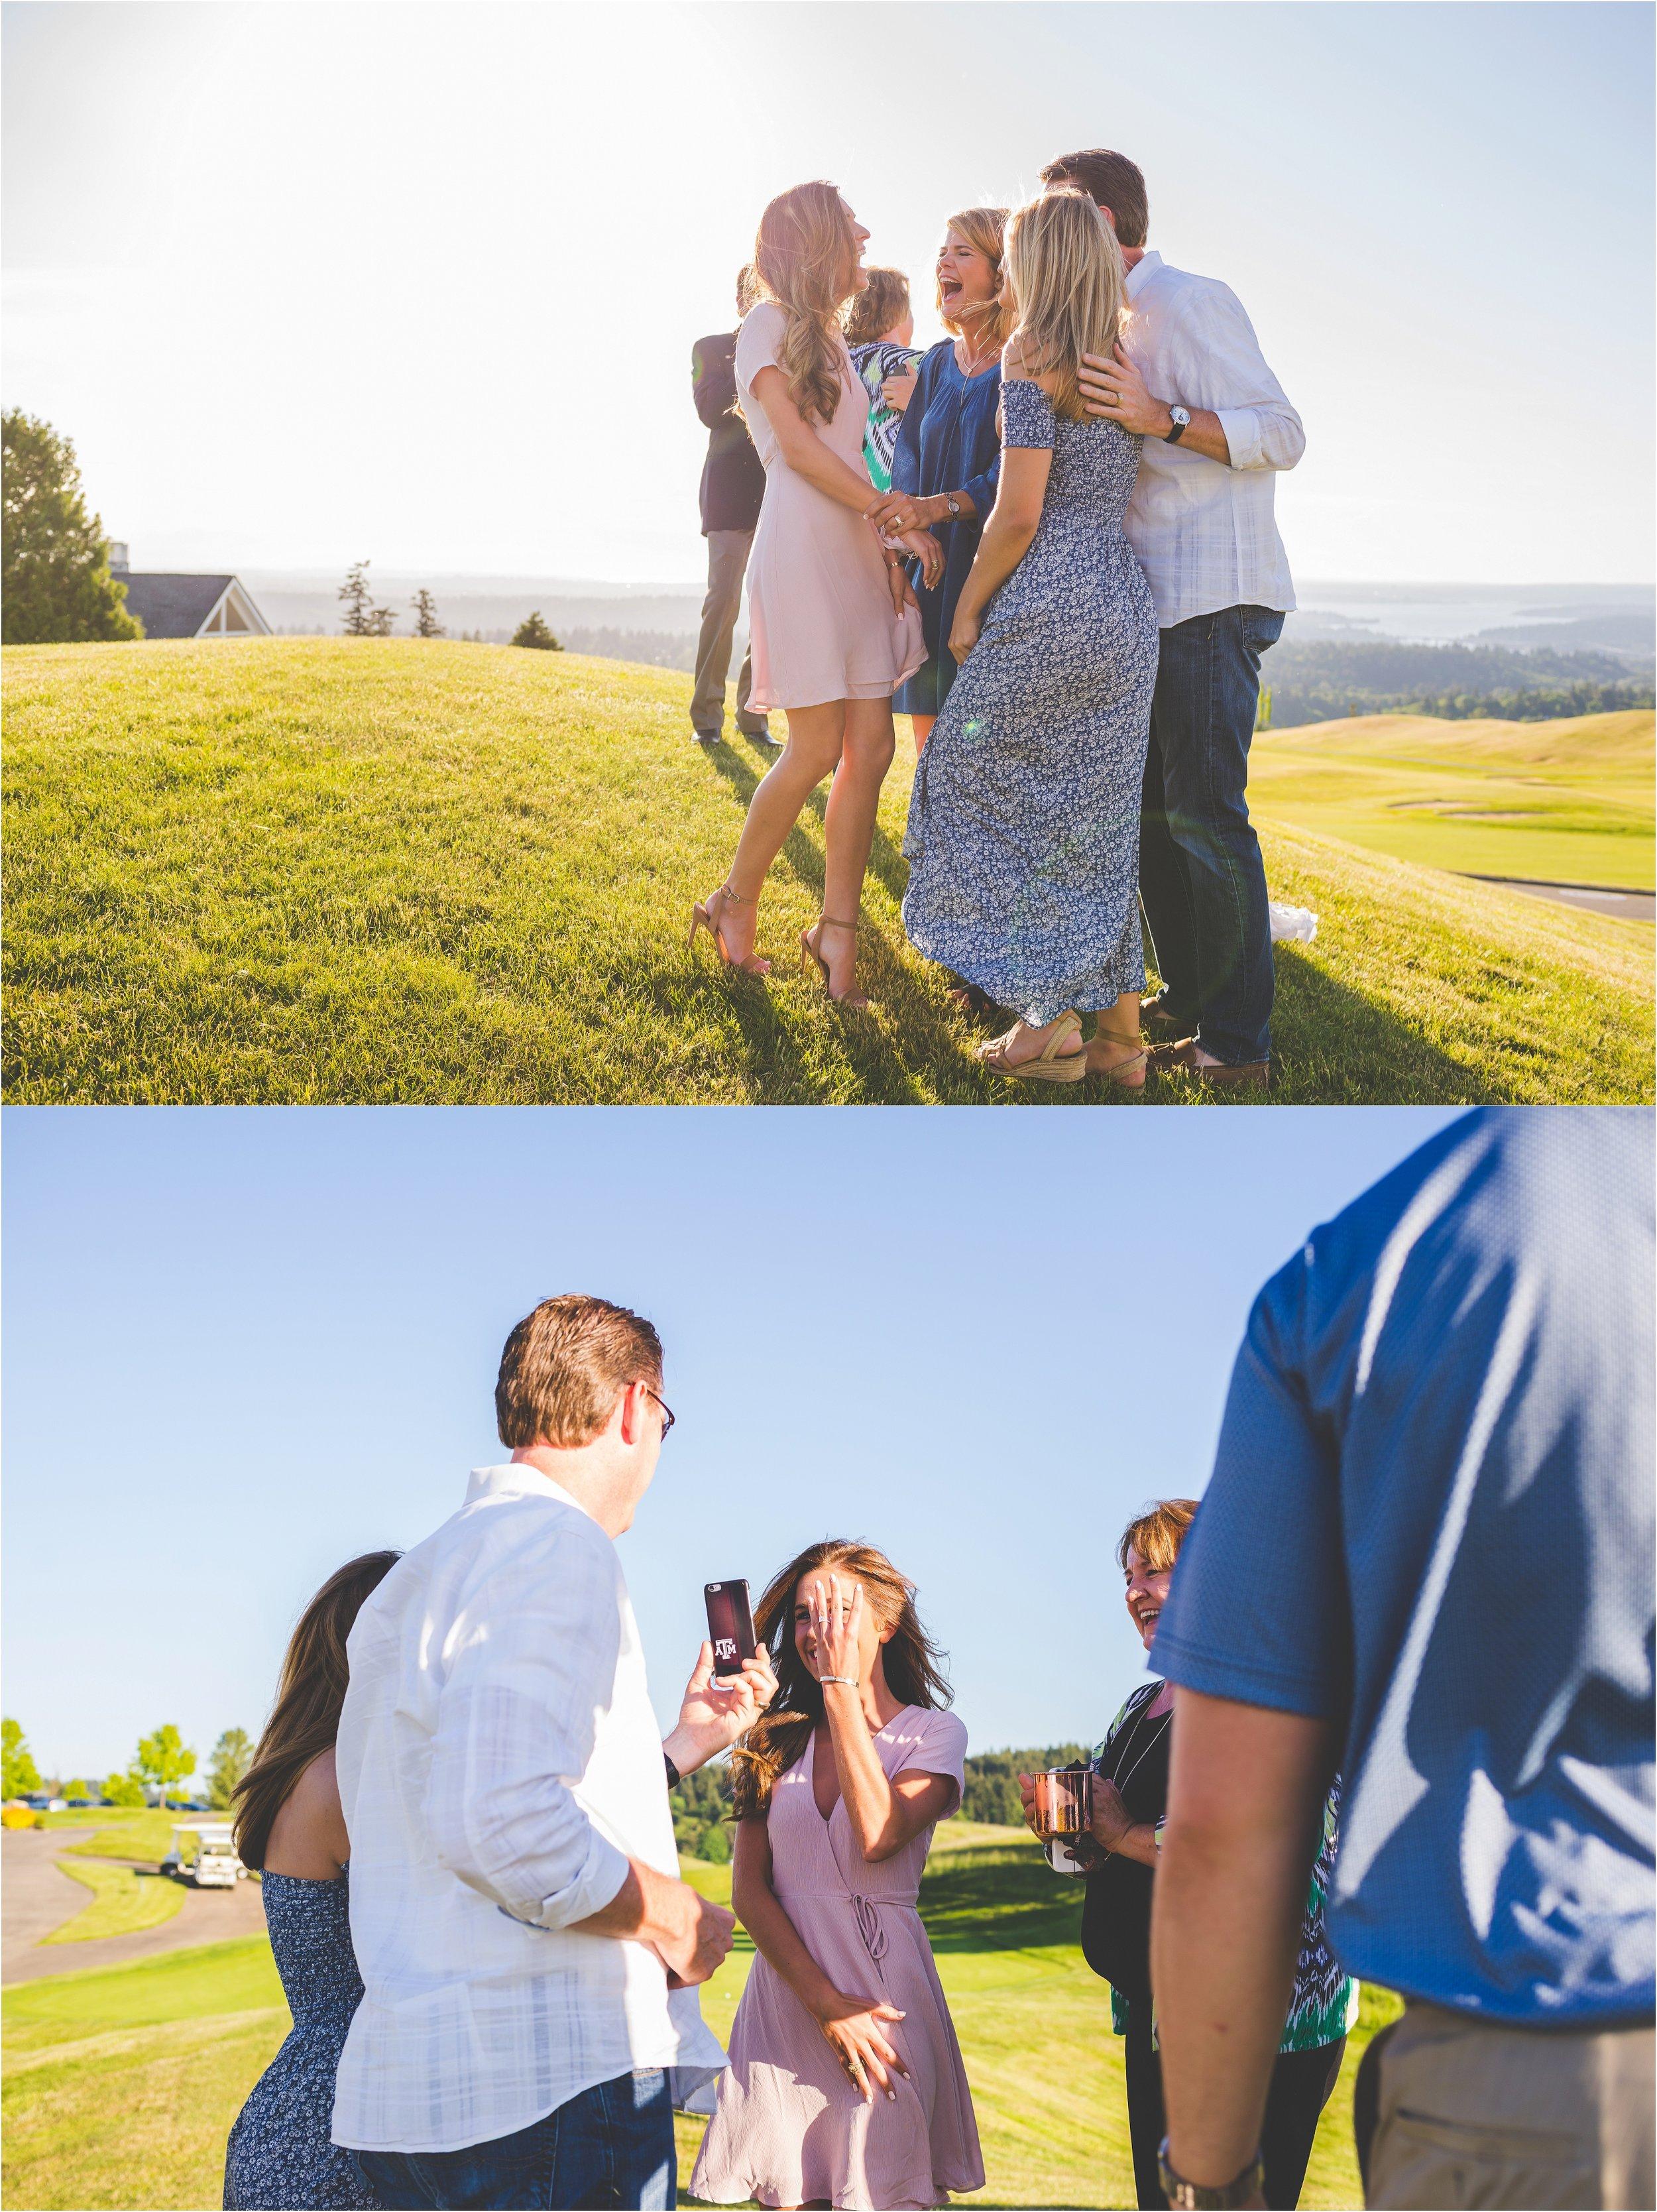 newcastle-golf-club-proposal-jannicka-mayte-seattle-washington-engagement-wedding-photographer_0014.jpg